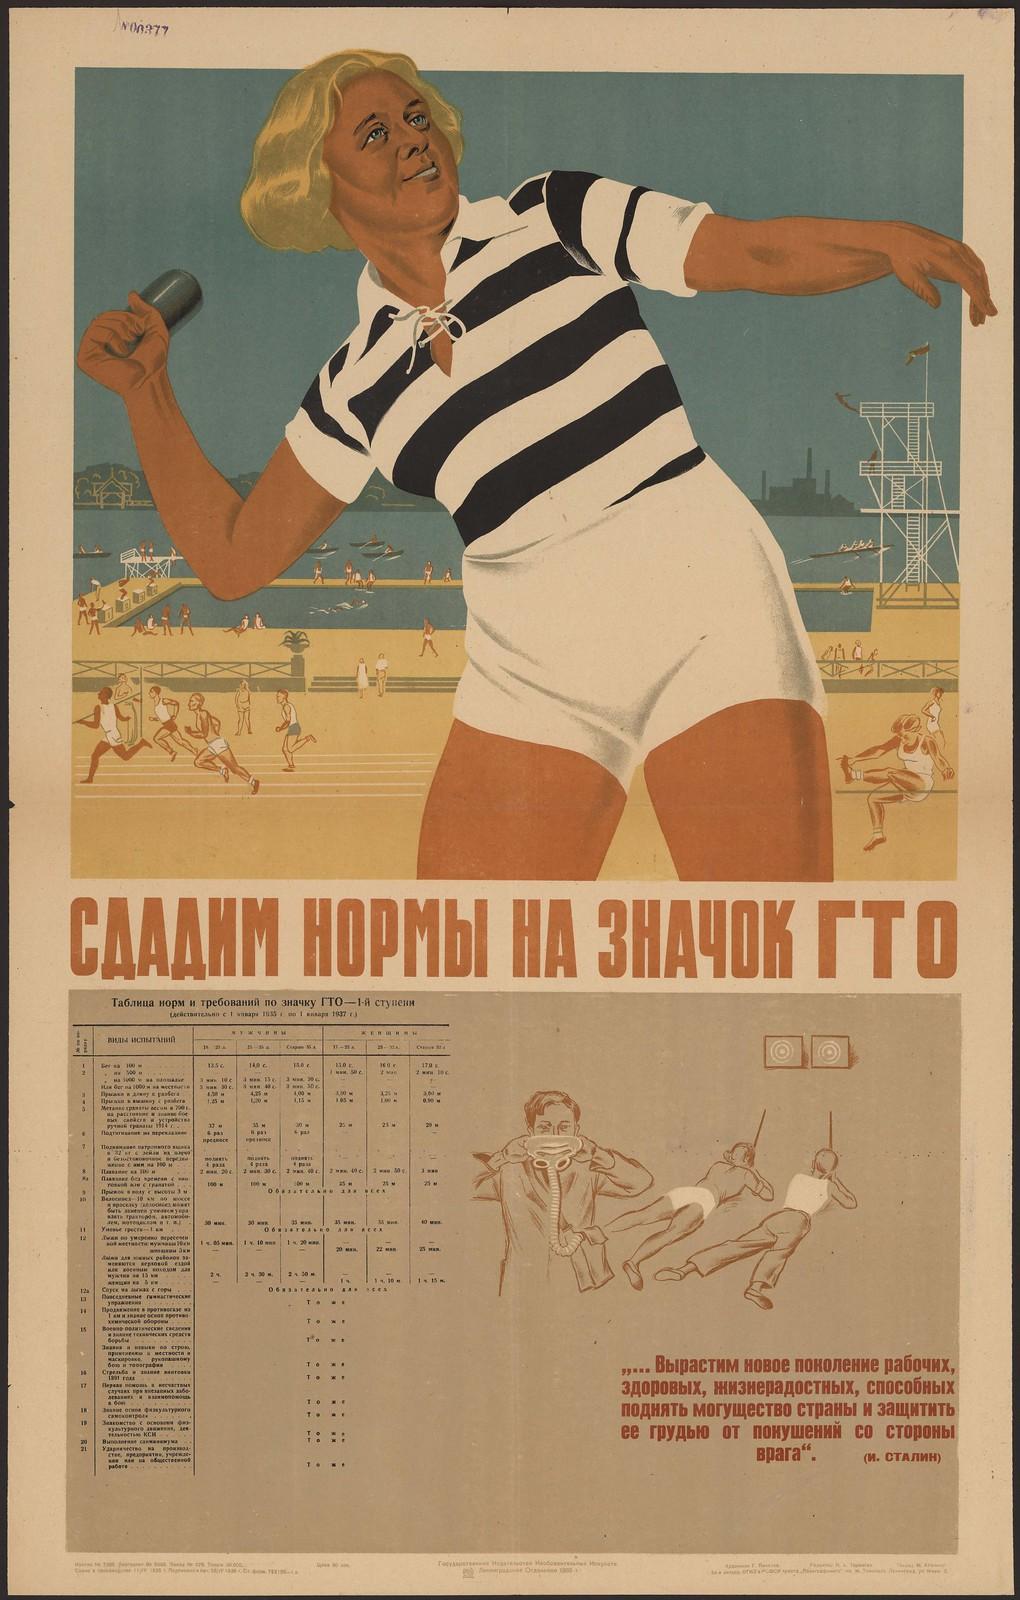 1935. Сдадим нормы на значок ГТО